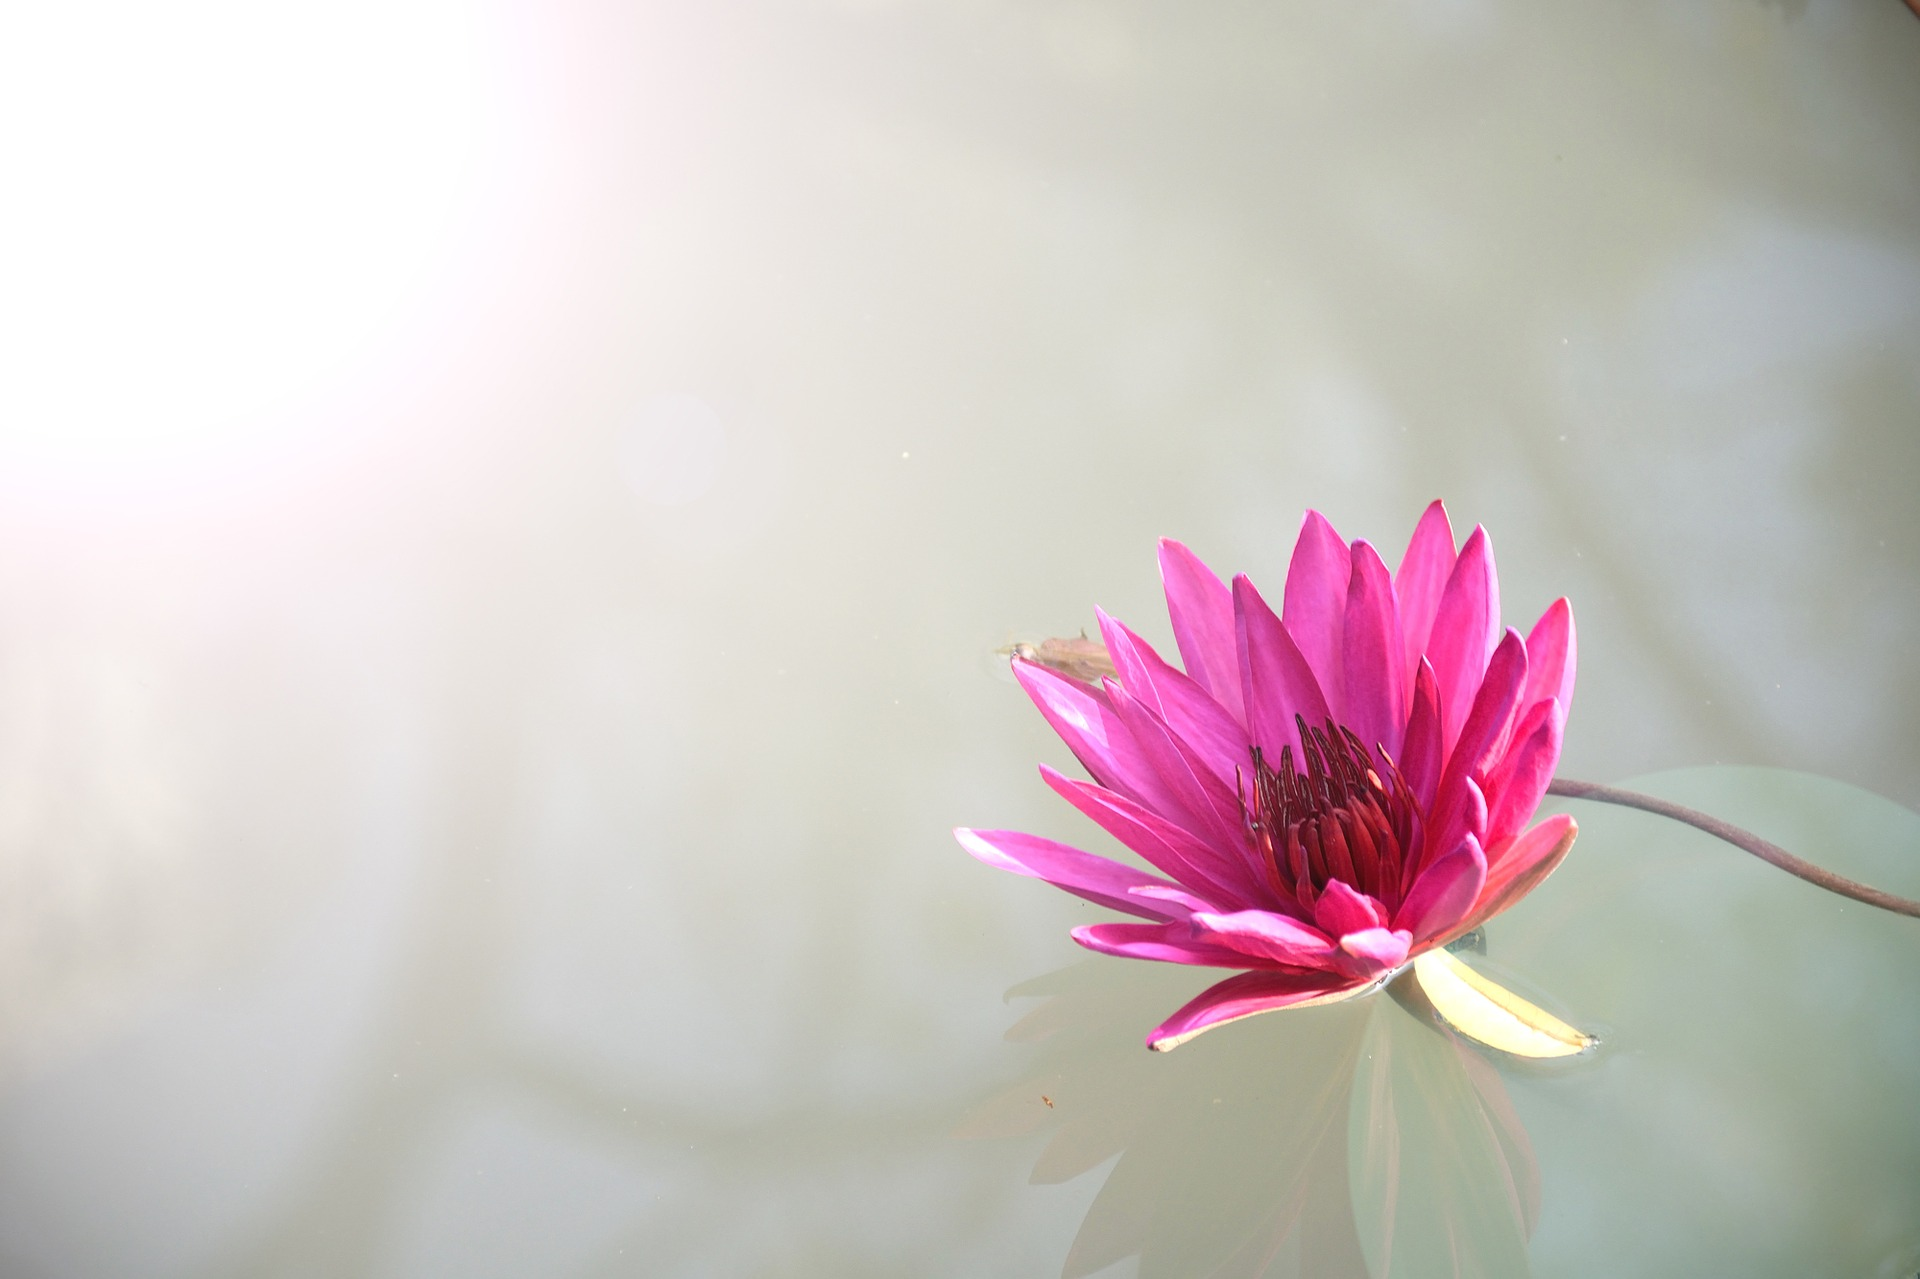 http://www.mindfulmente.it/wp-content/uploads/2019/09/flora-1839558_1920.jpg